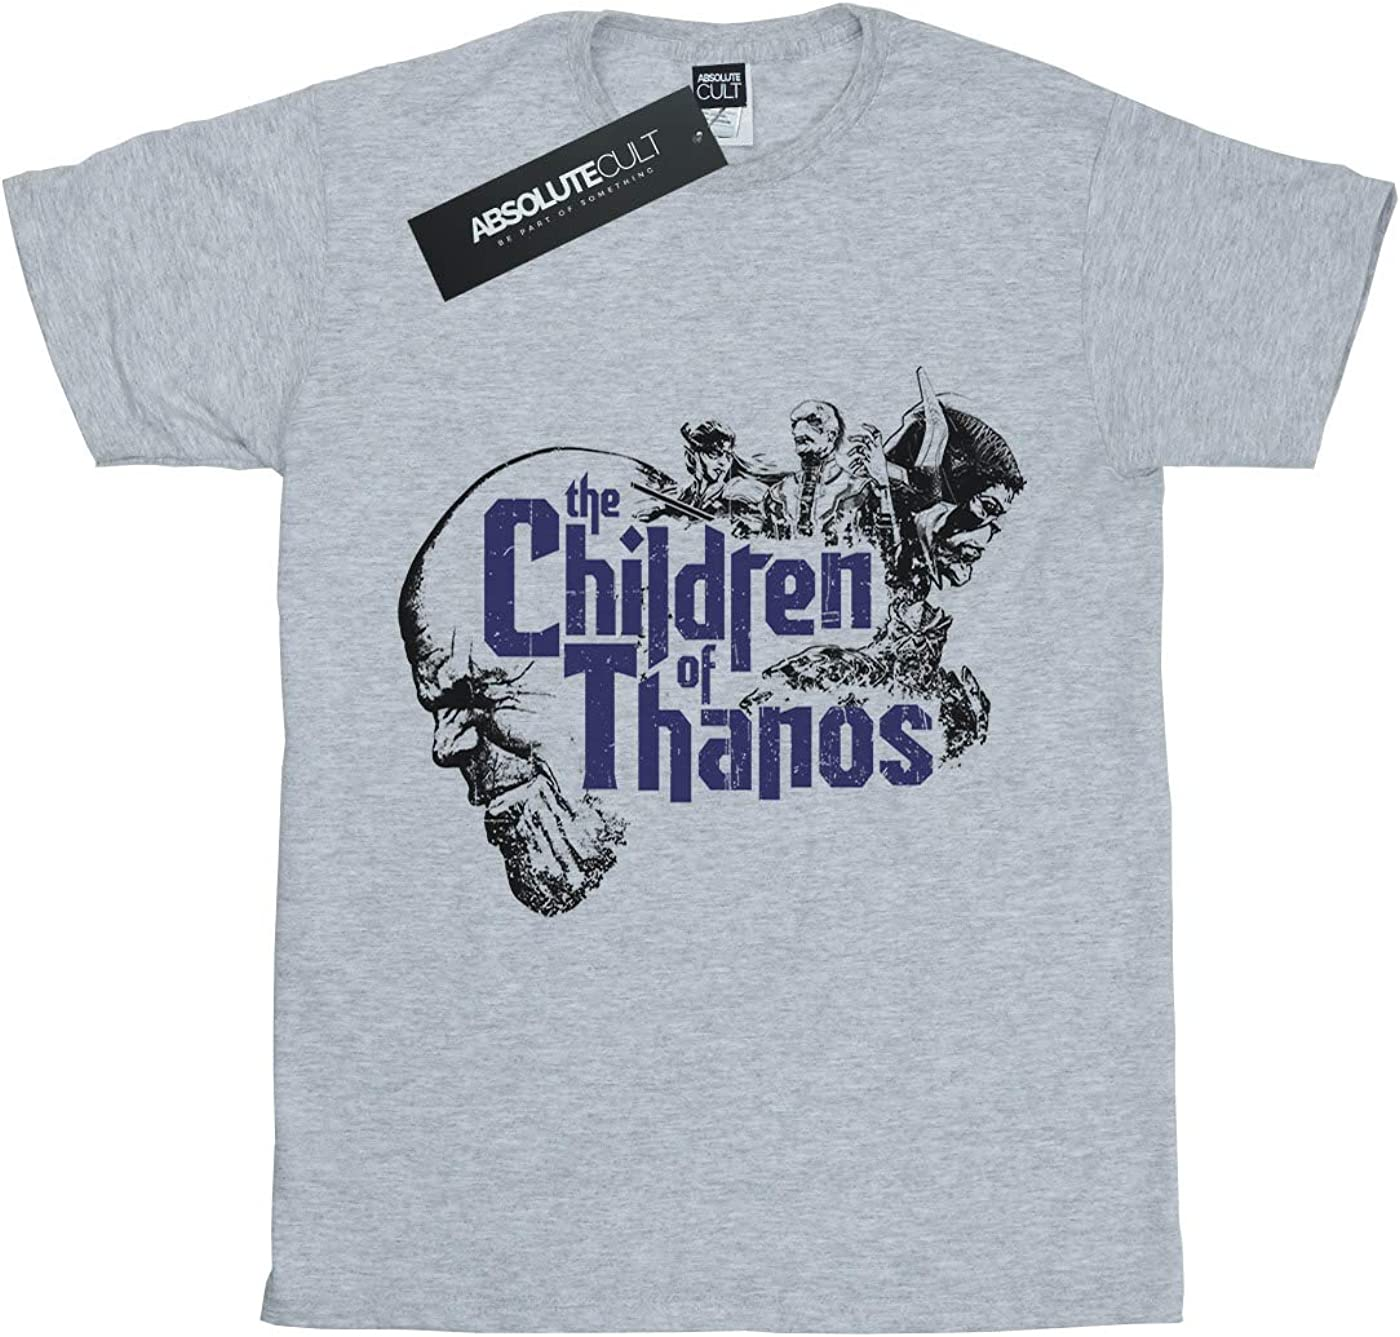 Avengers Boys Infinity War Children Of Thanos T-Shirt Sport Grey 7-8 Years